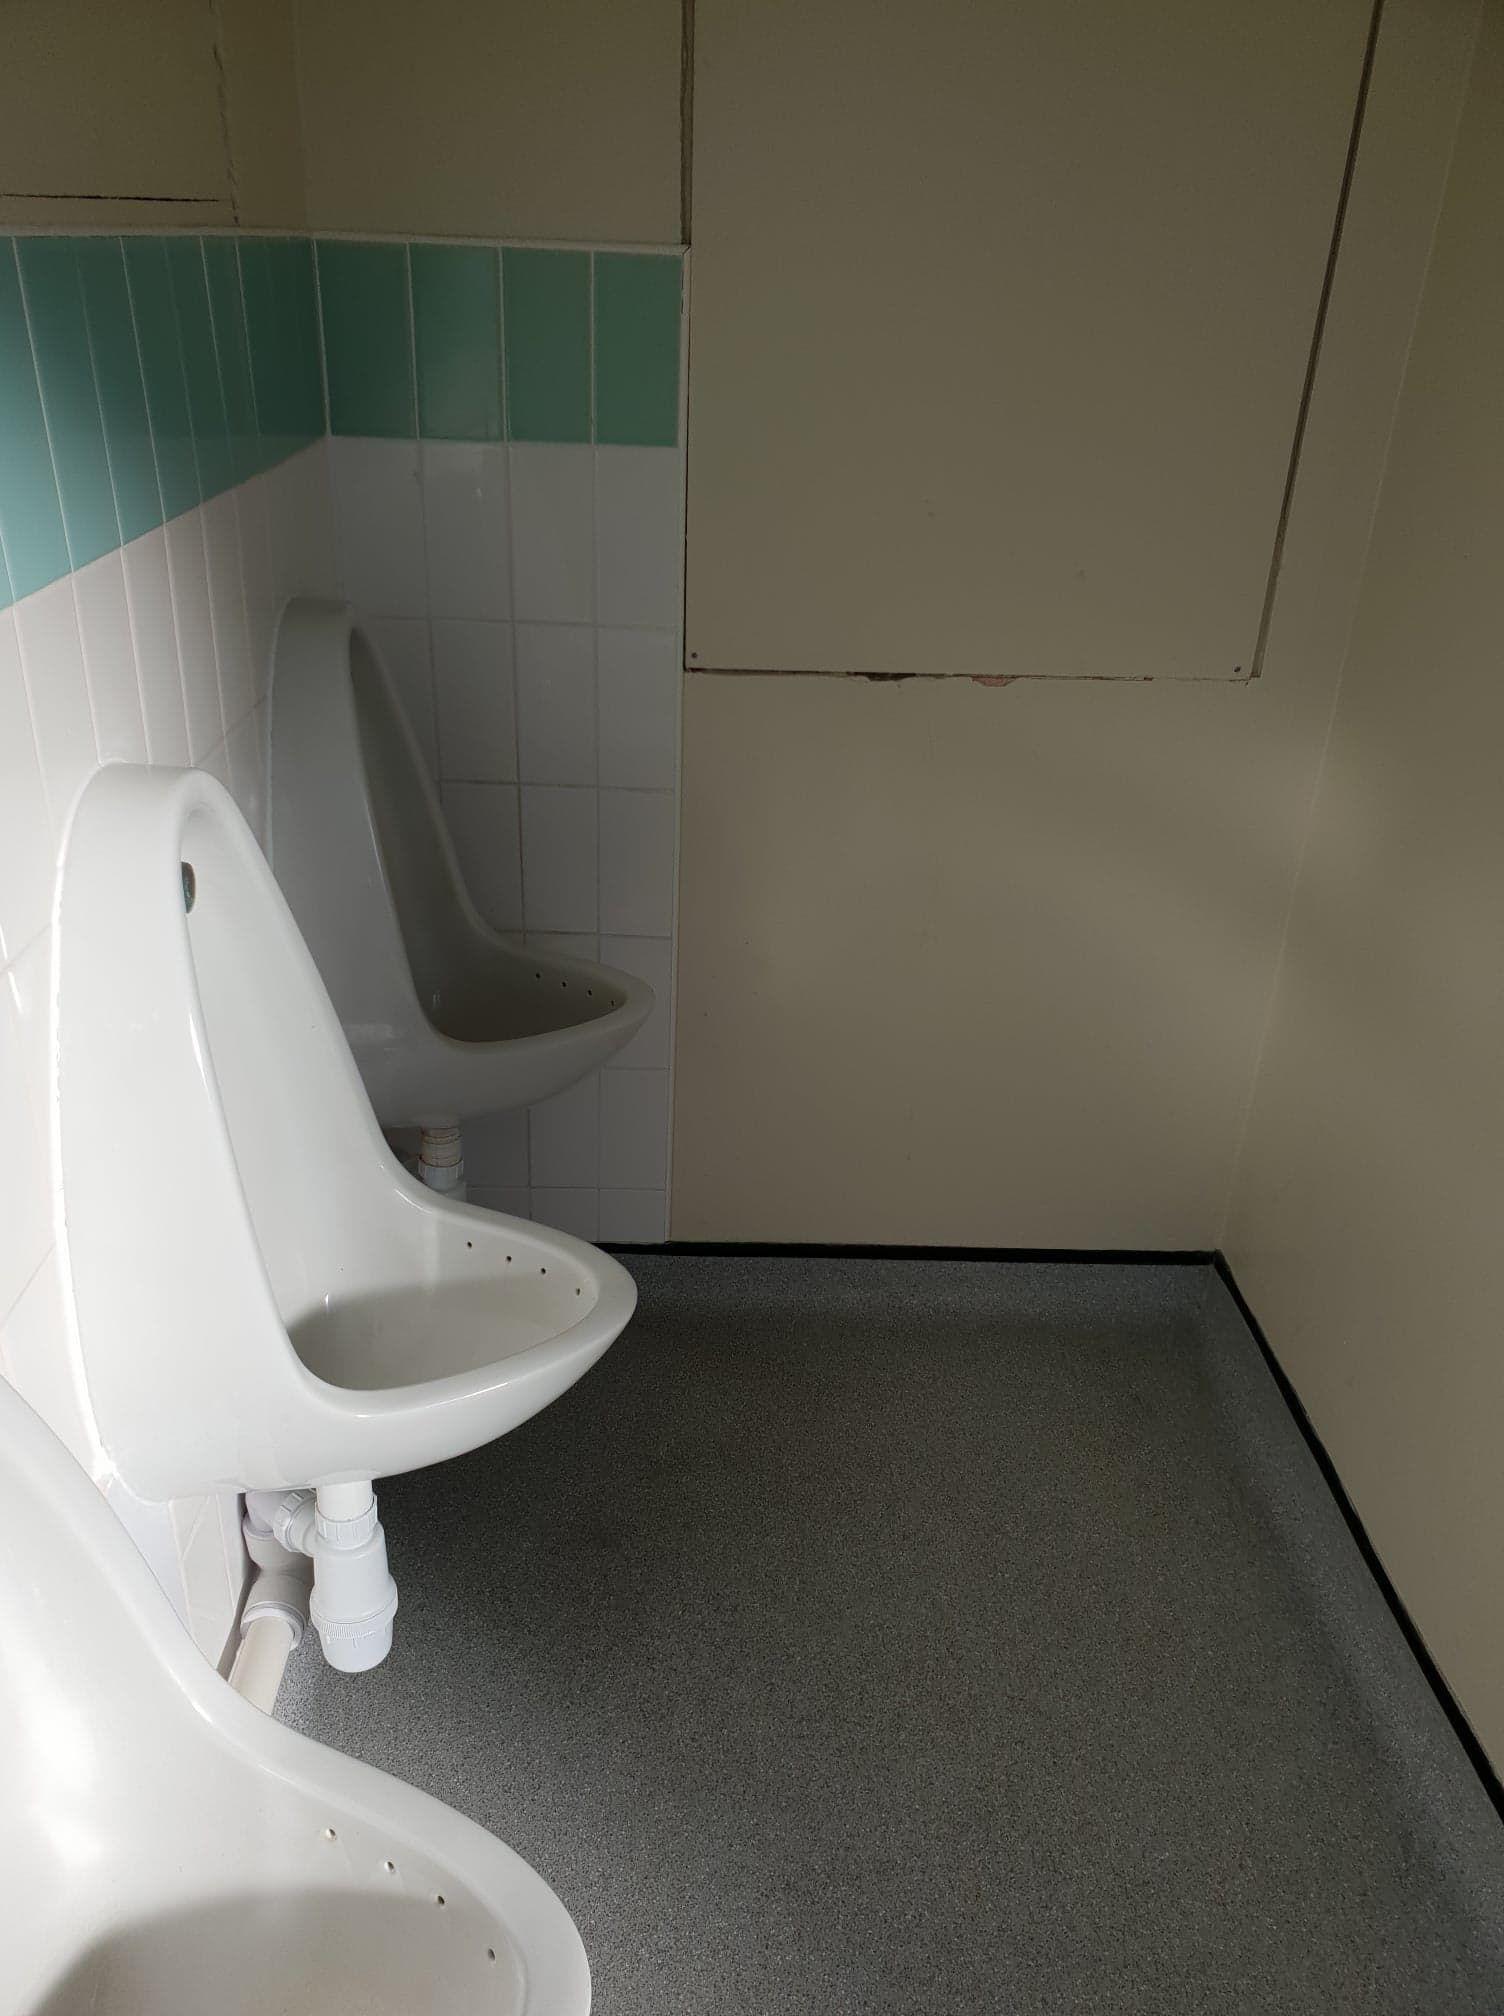 Image may contain: Interior Design, Chair, Furniture, Toilet, Bathroom, Flooring, Floor, Room, Indoors